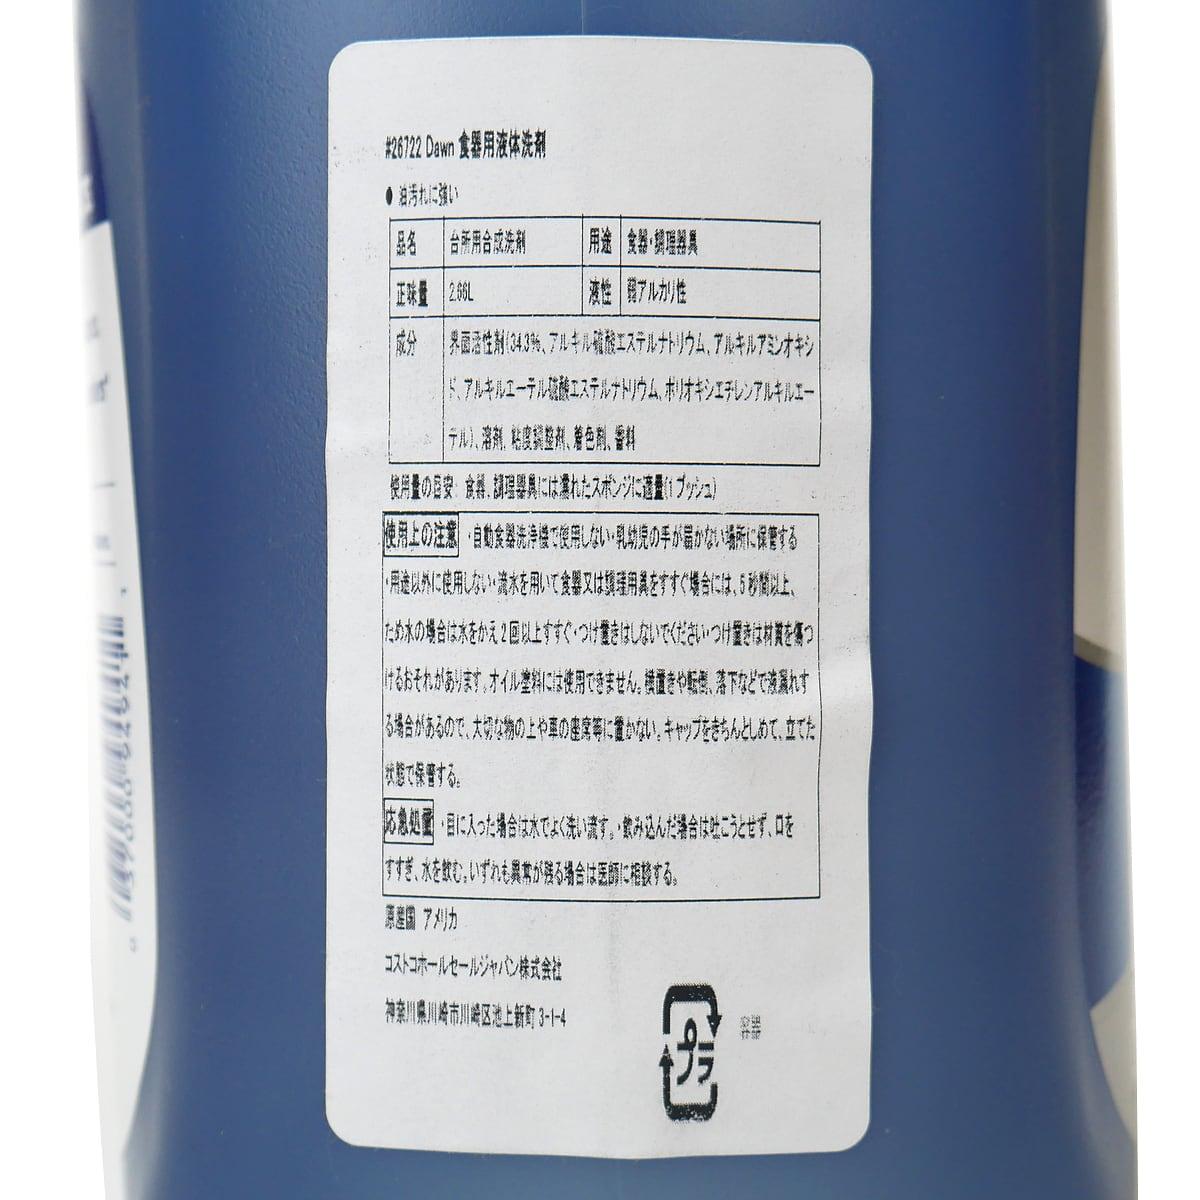 DAWN ウルトラプラチナム 食器用洗剤 2.66L 裏面ラベル(成分ほか)